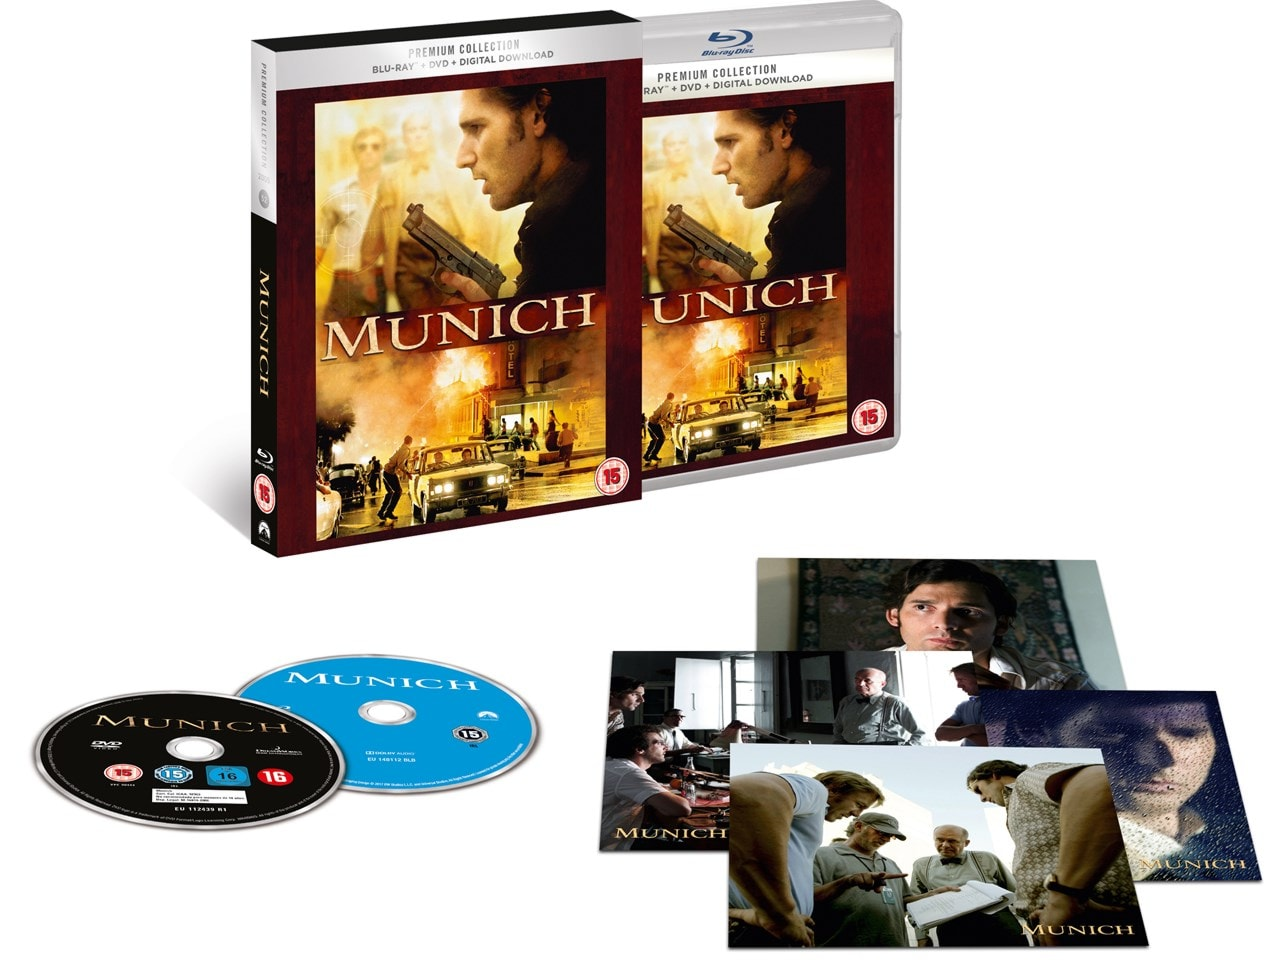 Munich (hmv Exclusive) - The Premium Collection - 3